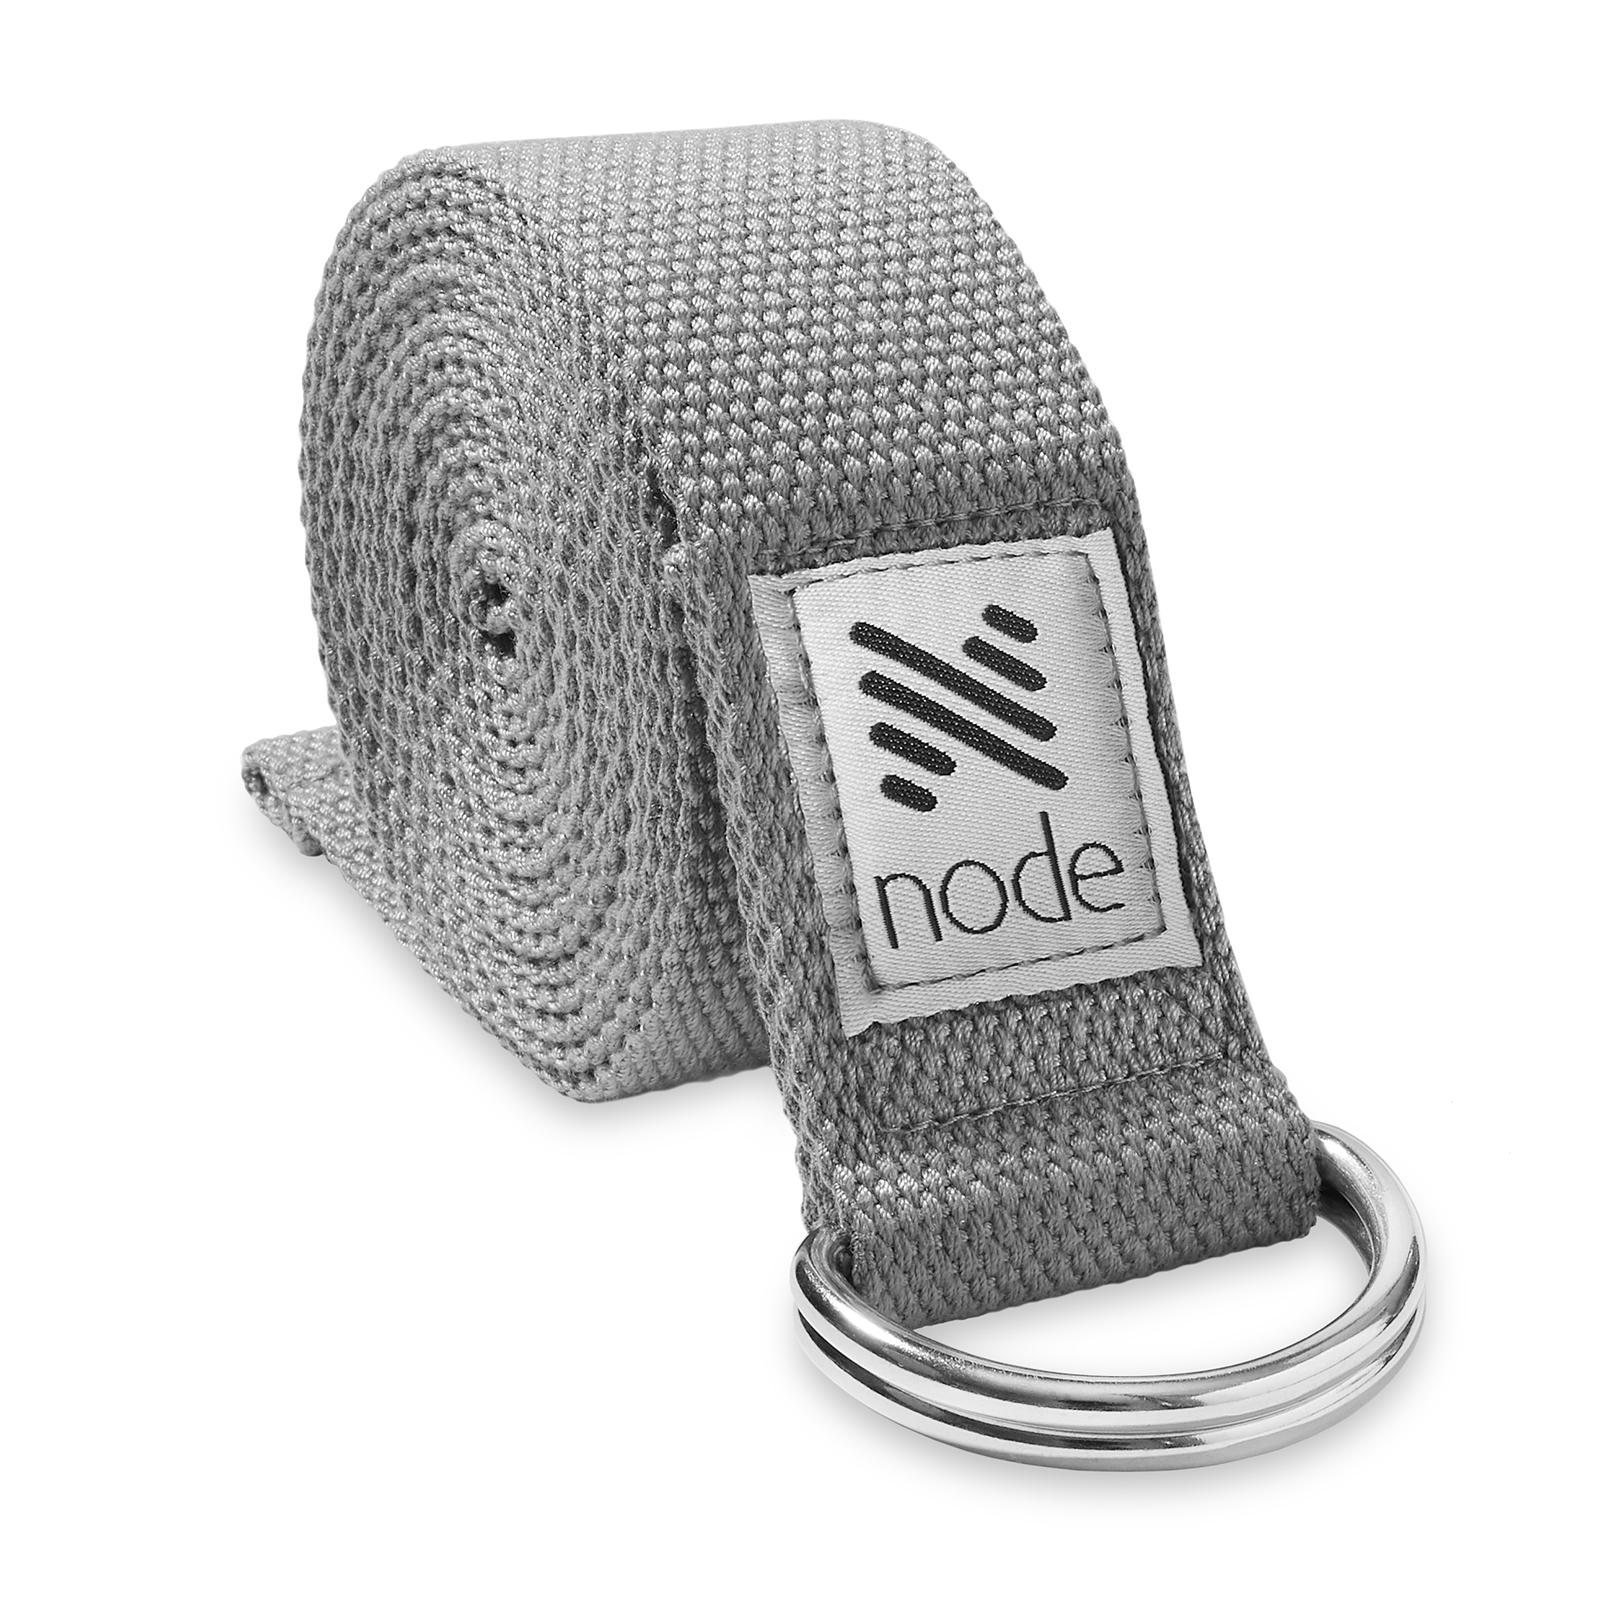 7-1-2-039-Woven-Cotton-Blend-Yoga-Strap-Stretching-Exercise-Prop-Belt thumbnail 8